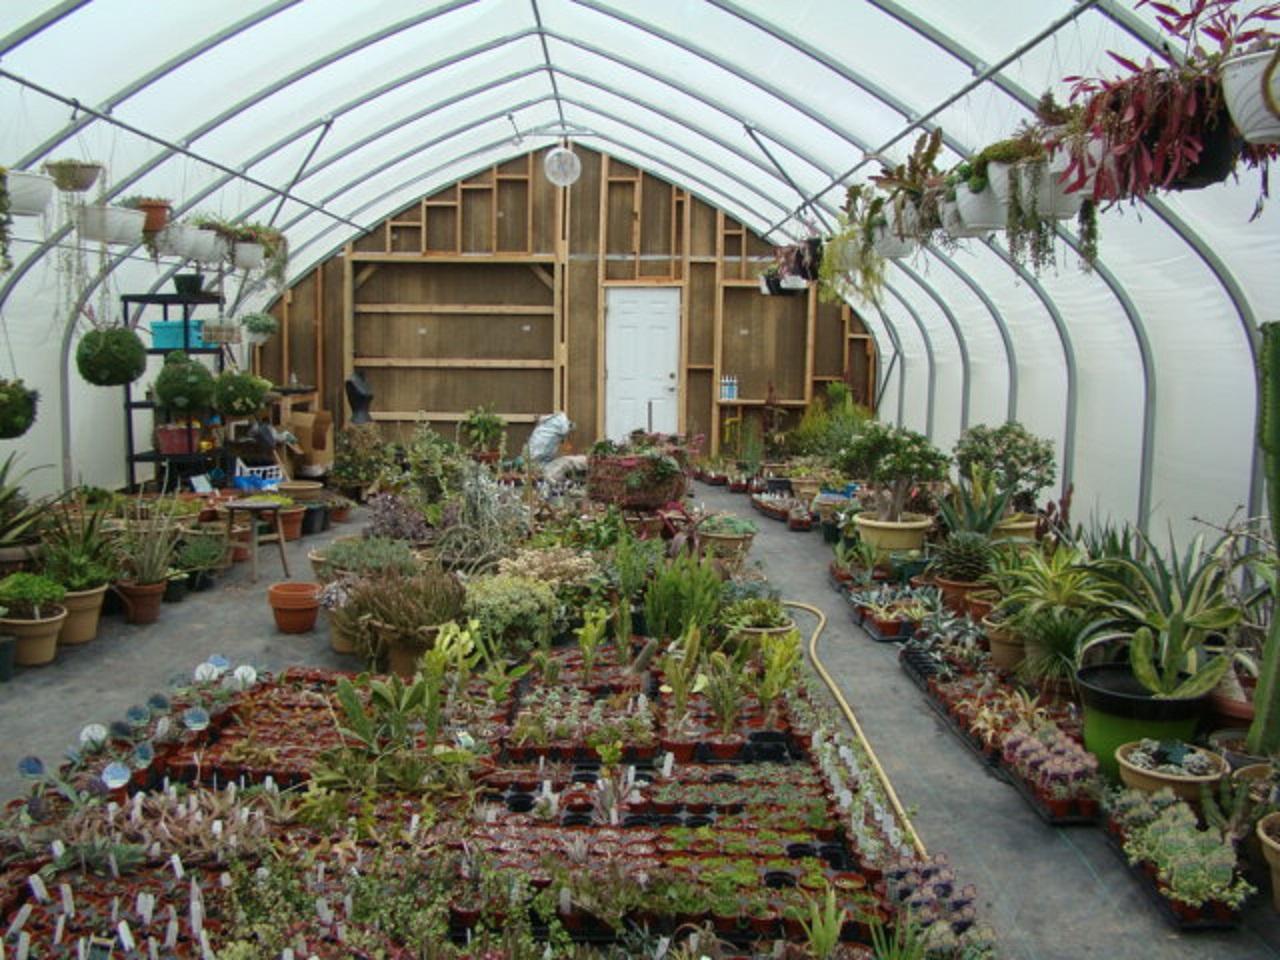 McDaniel's New Greenhouse